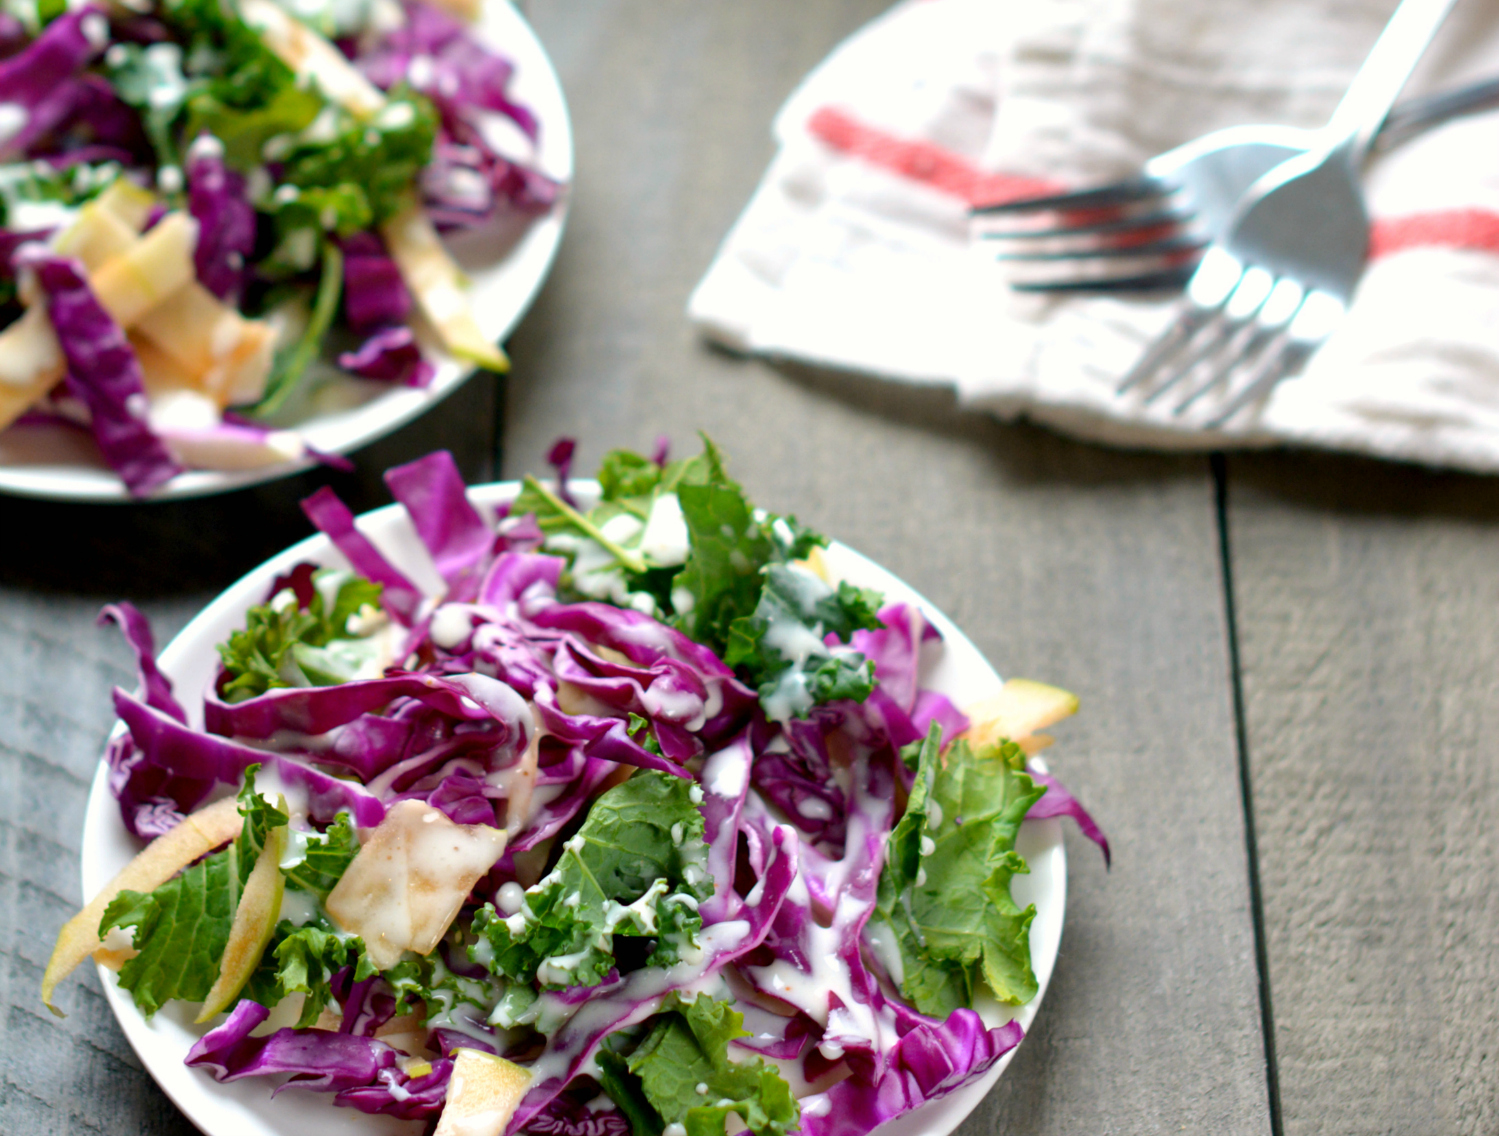 Creamy Kale Apple Coleslaw: Grandma's Recipe, Updated